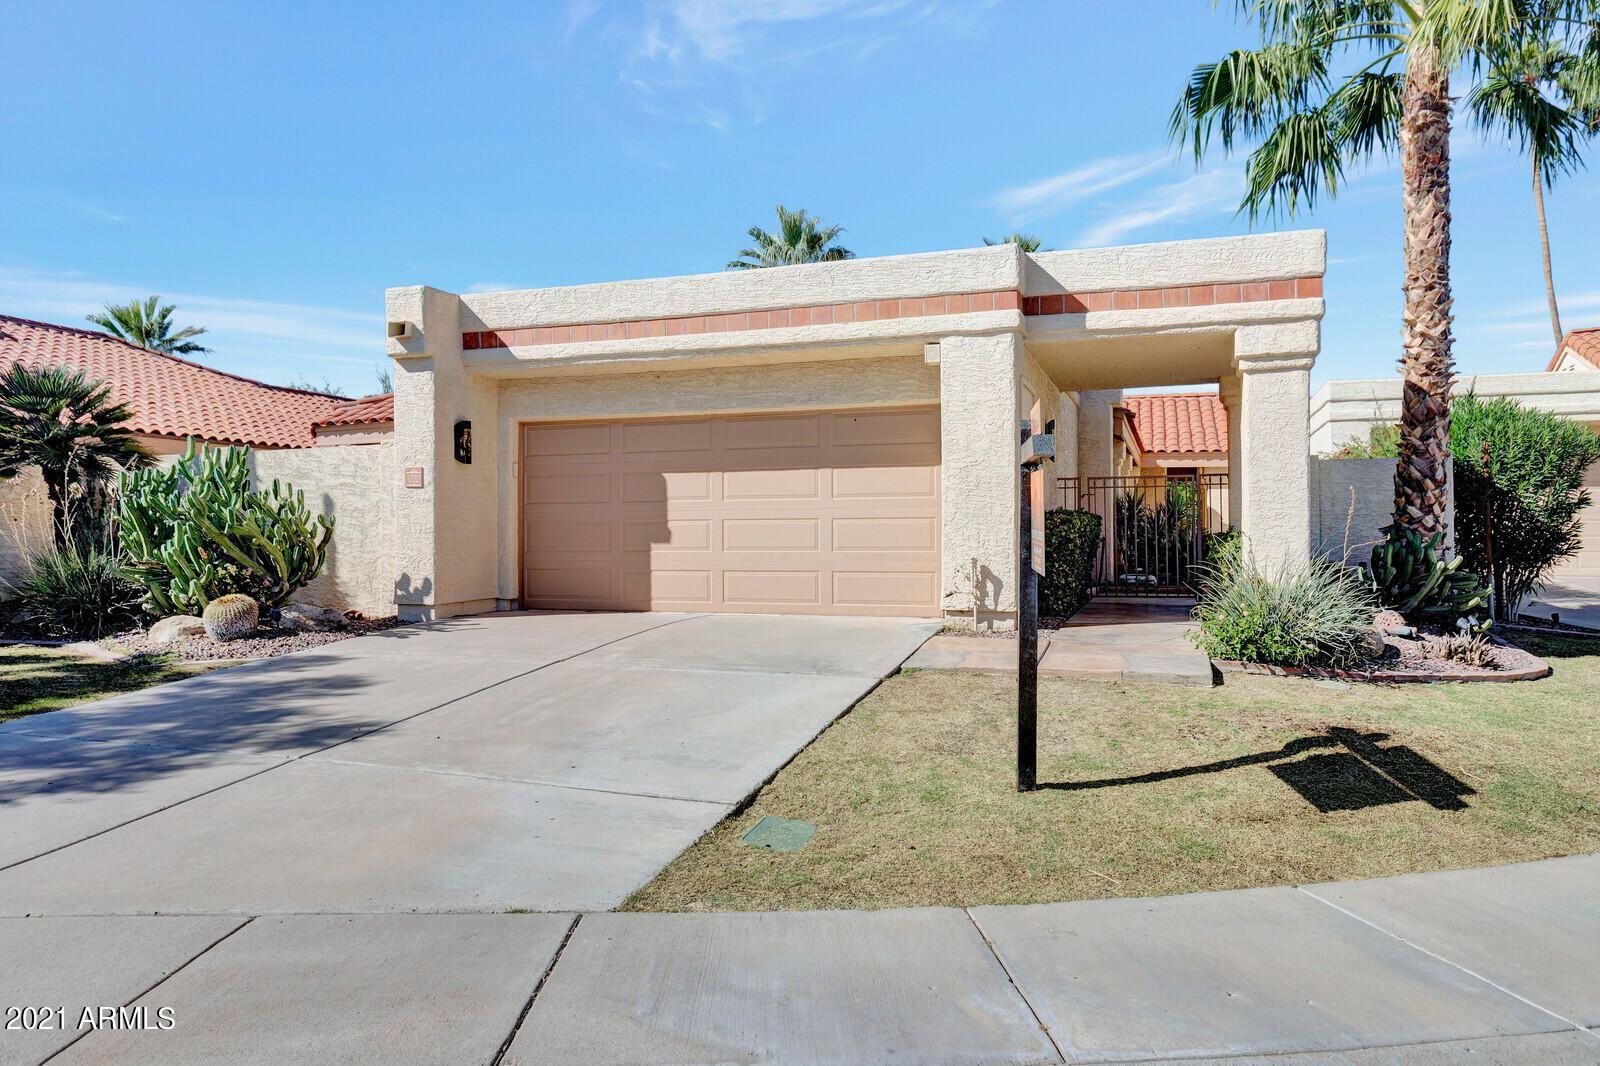 Photo of 10012 E SUNNYSLOPE Lane, Scottsdale, AZ 85258 (MLS # 6307822)